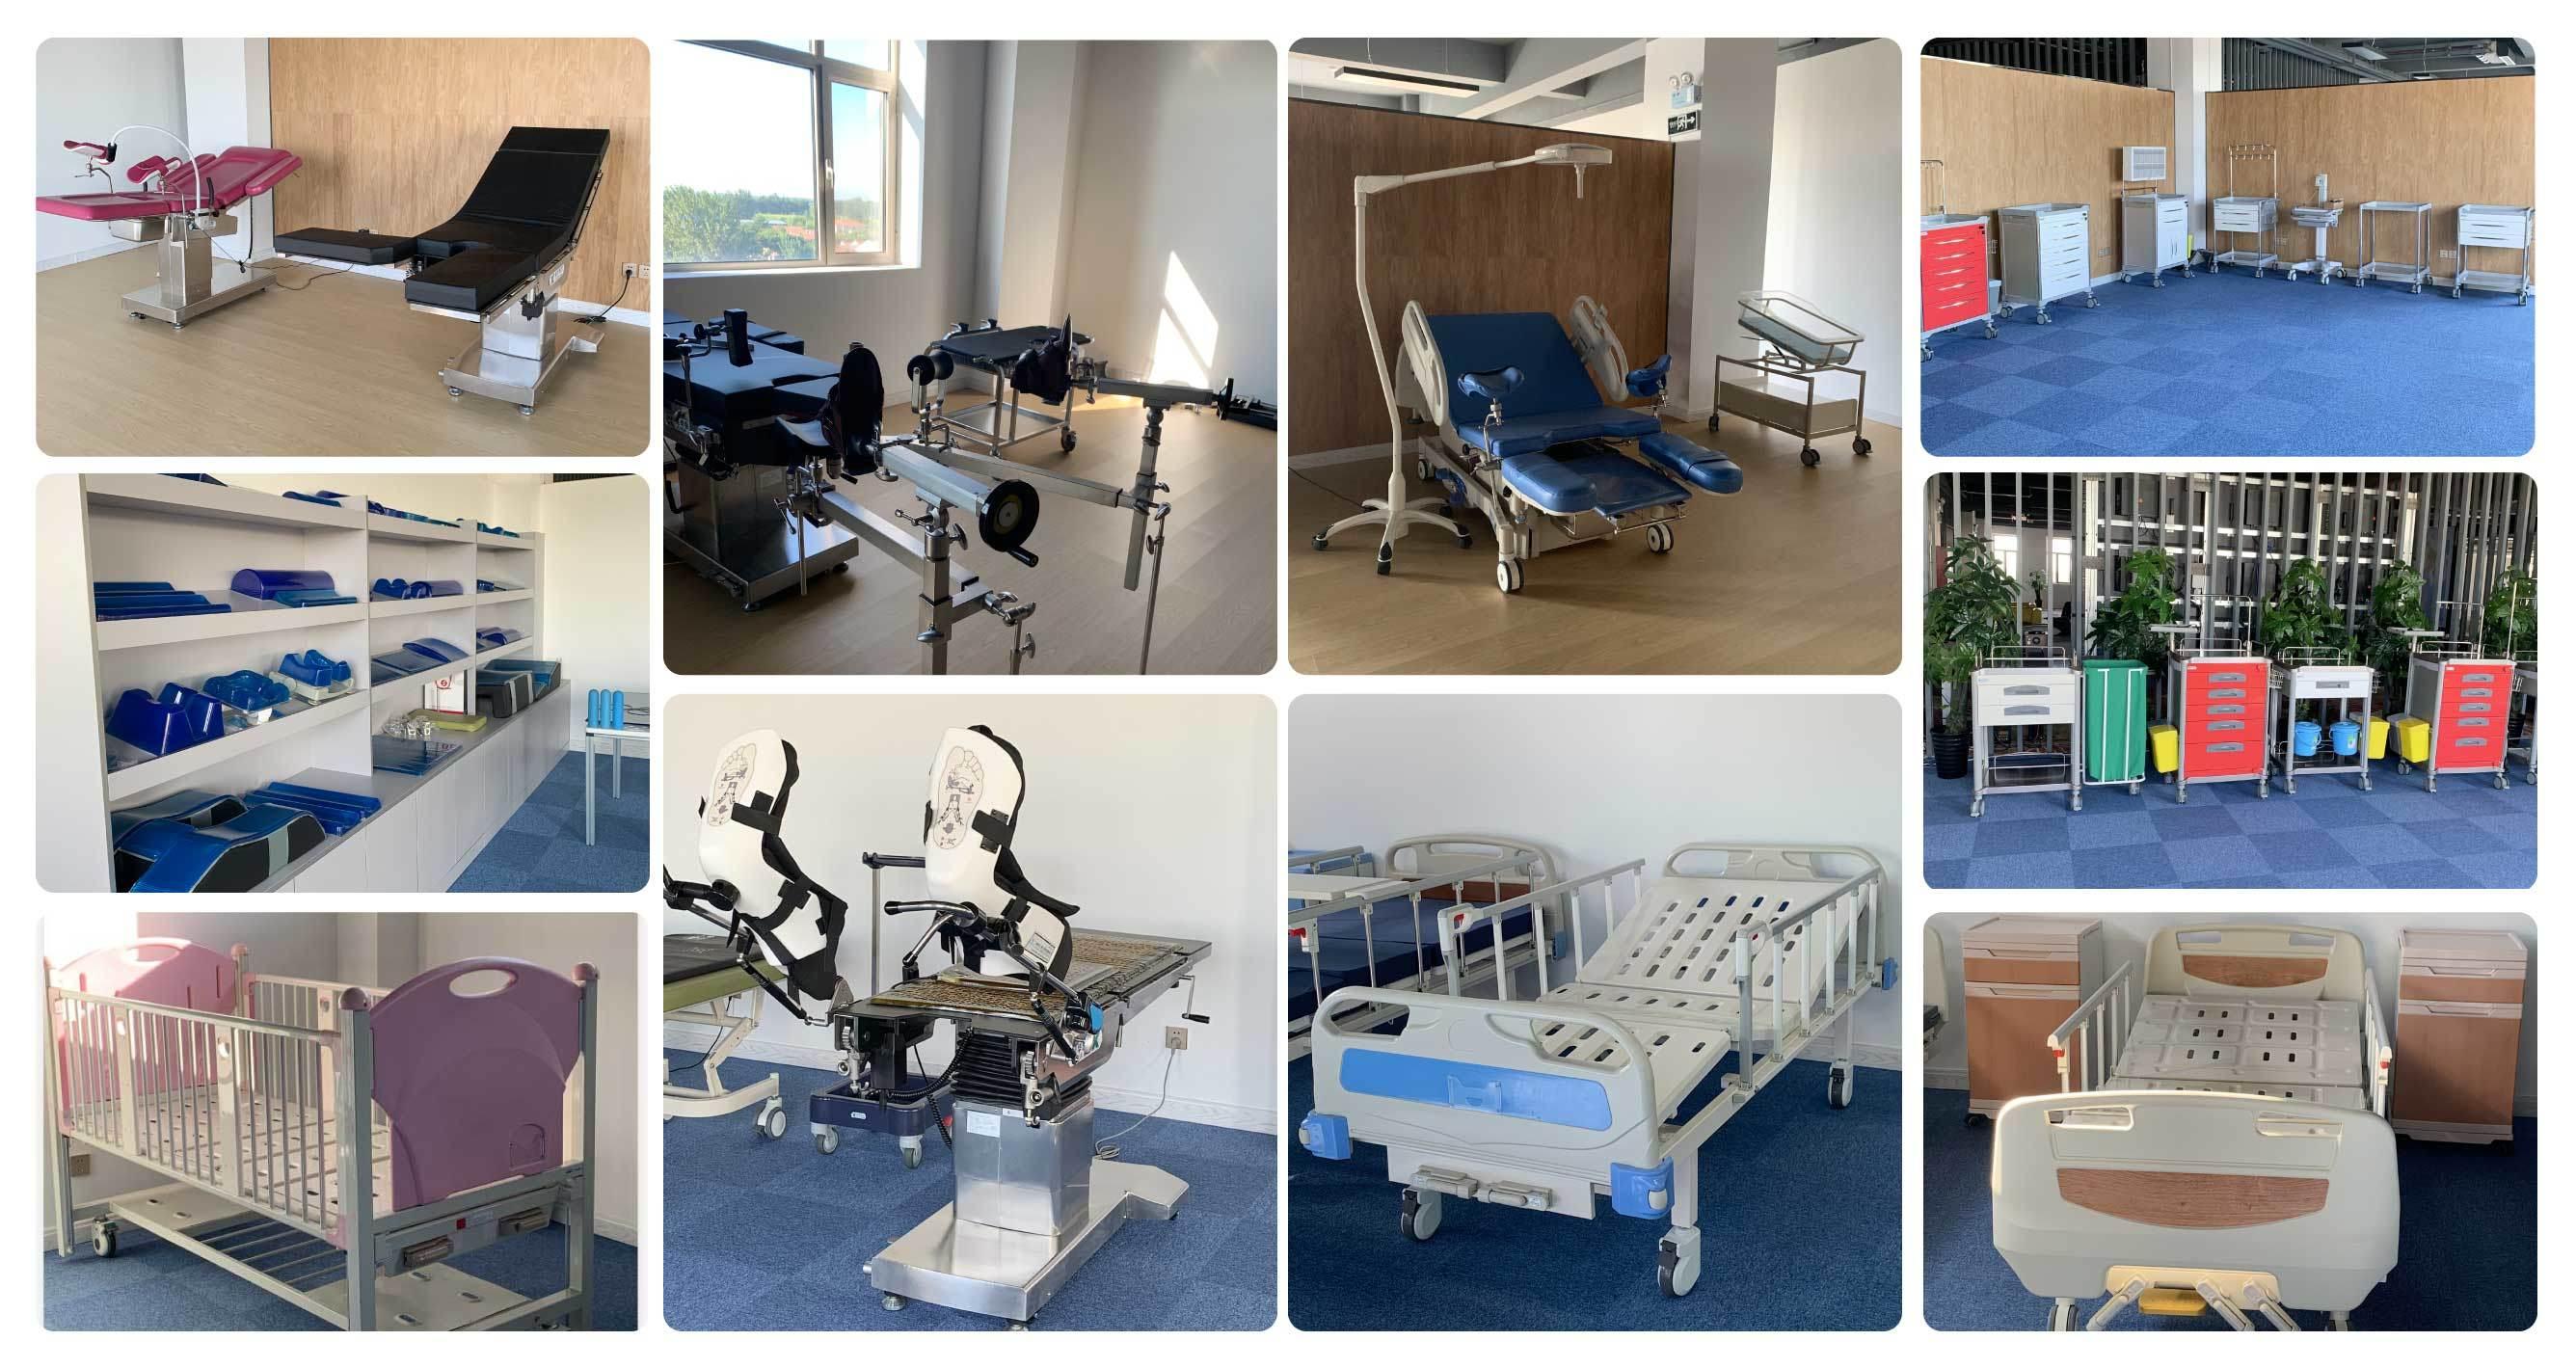 Intelligent Electric Hospital Delivery Bed for Ldr Room